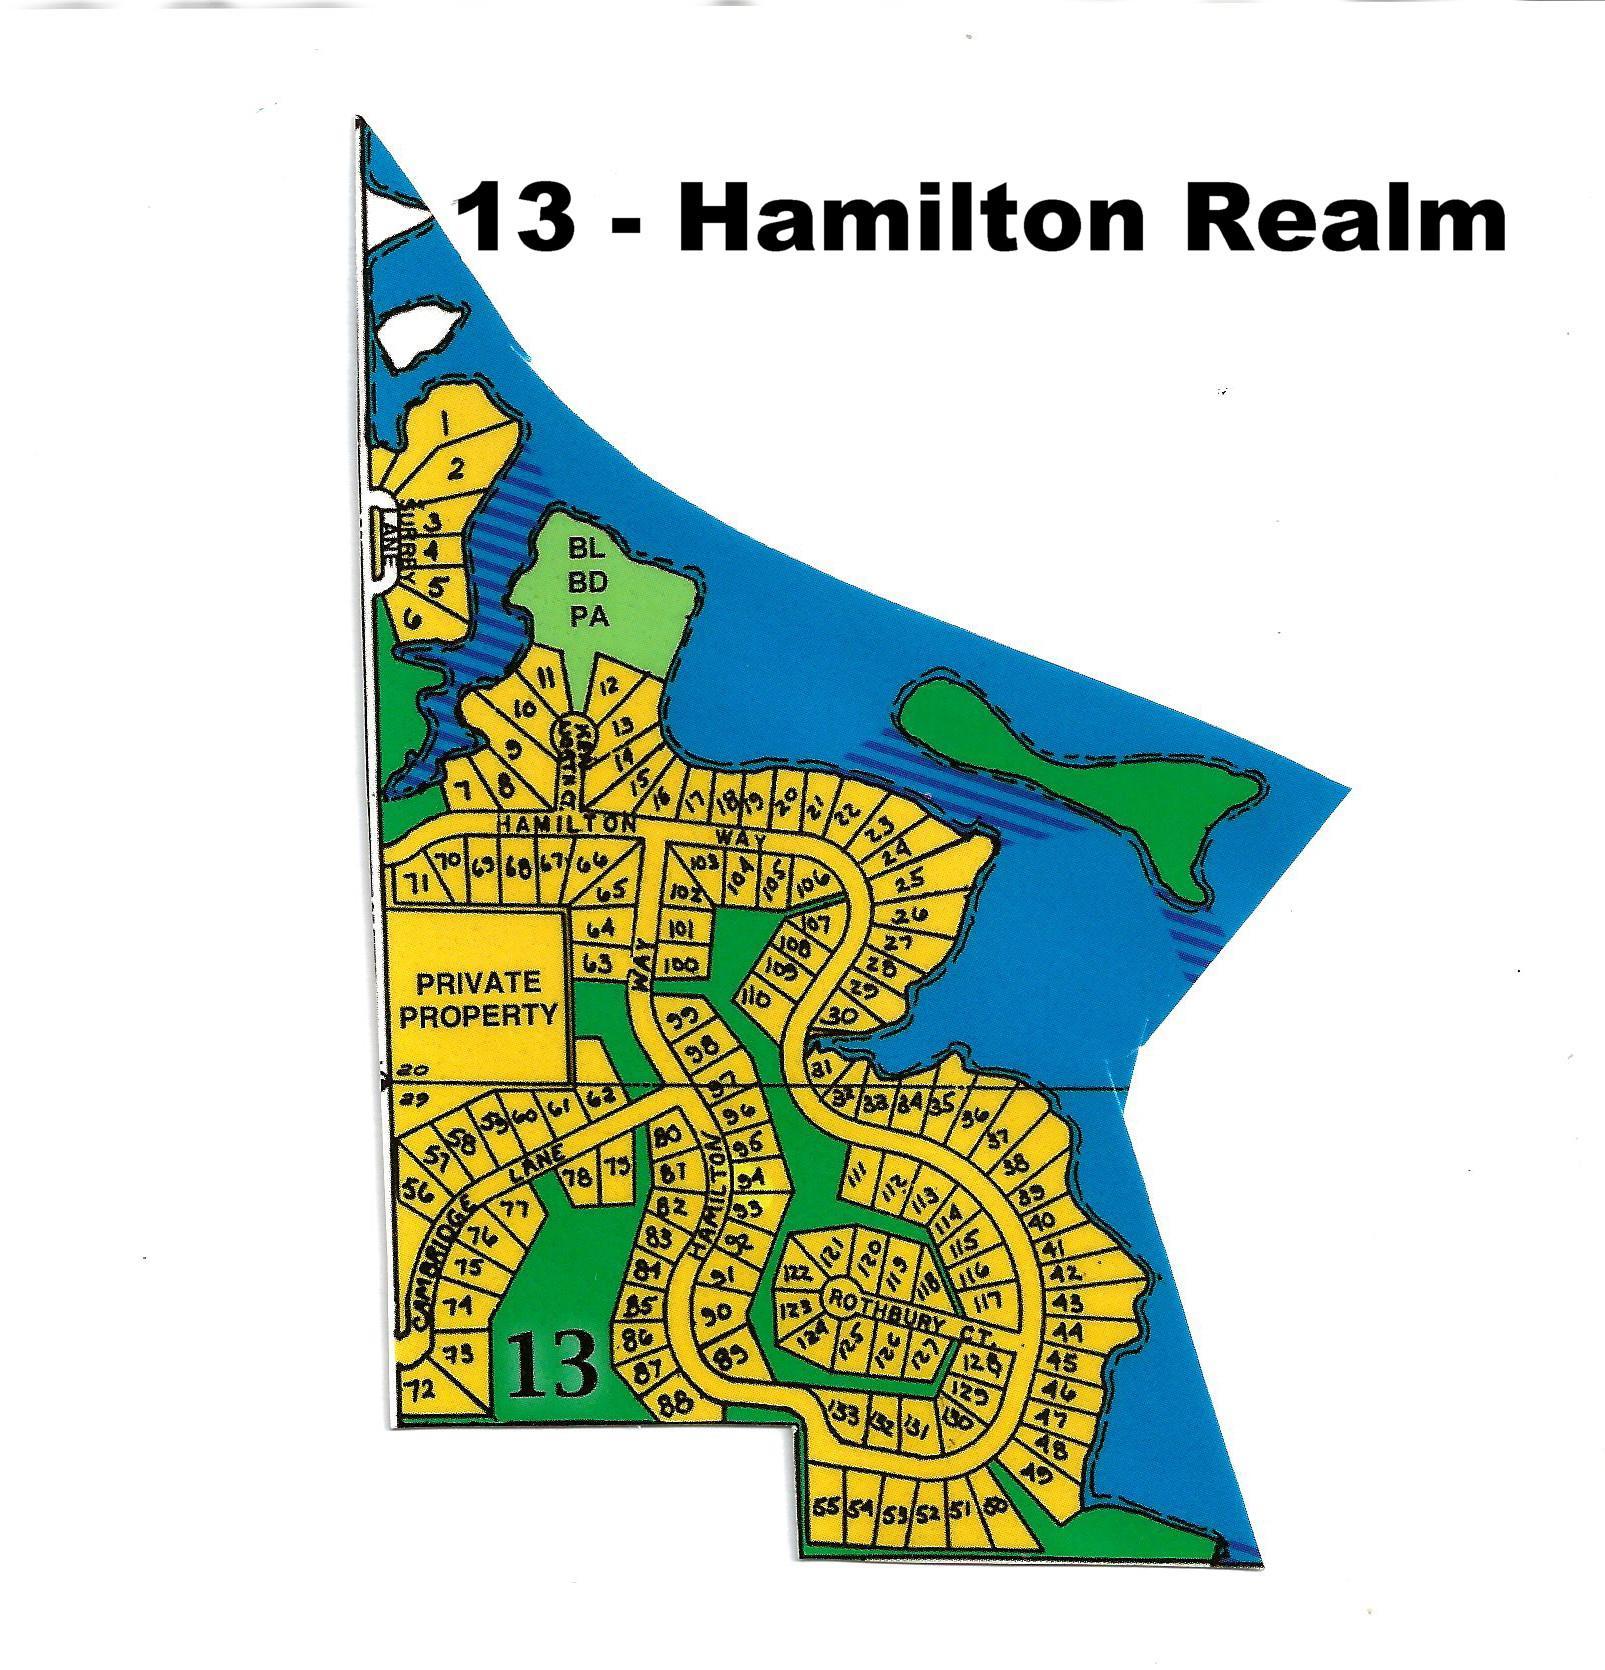 13  - HAMILTON REALM (HA)